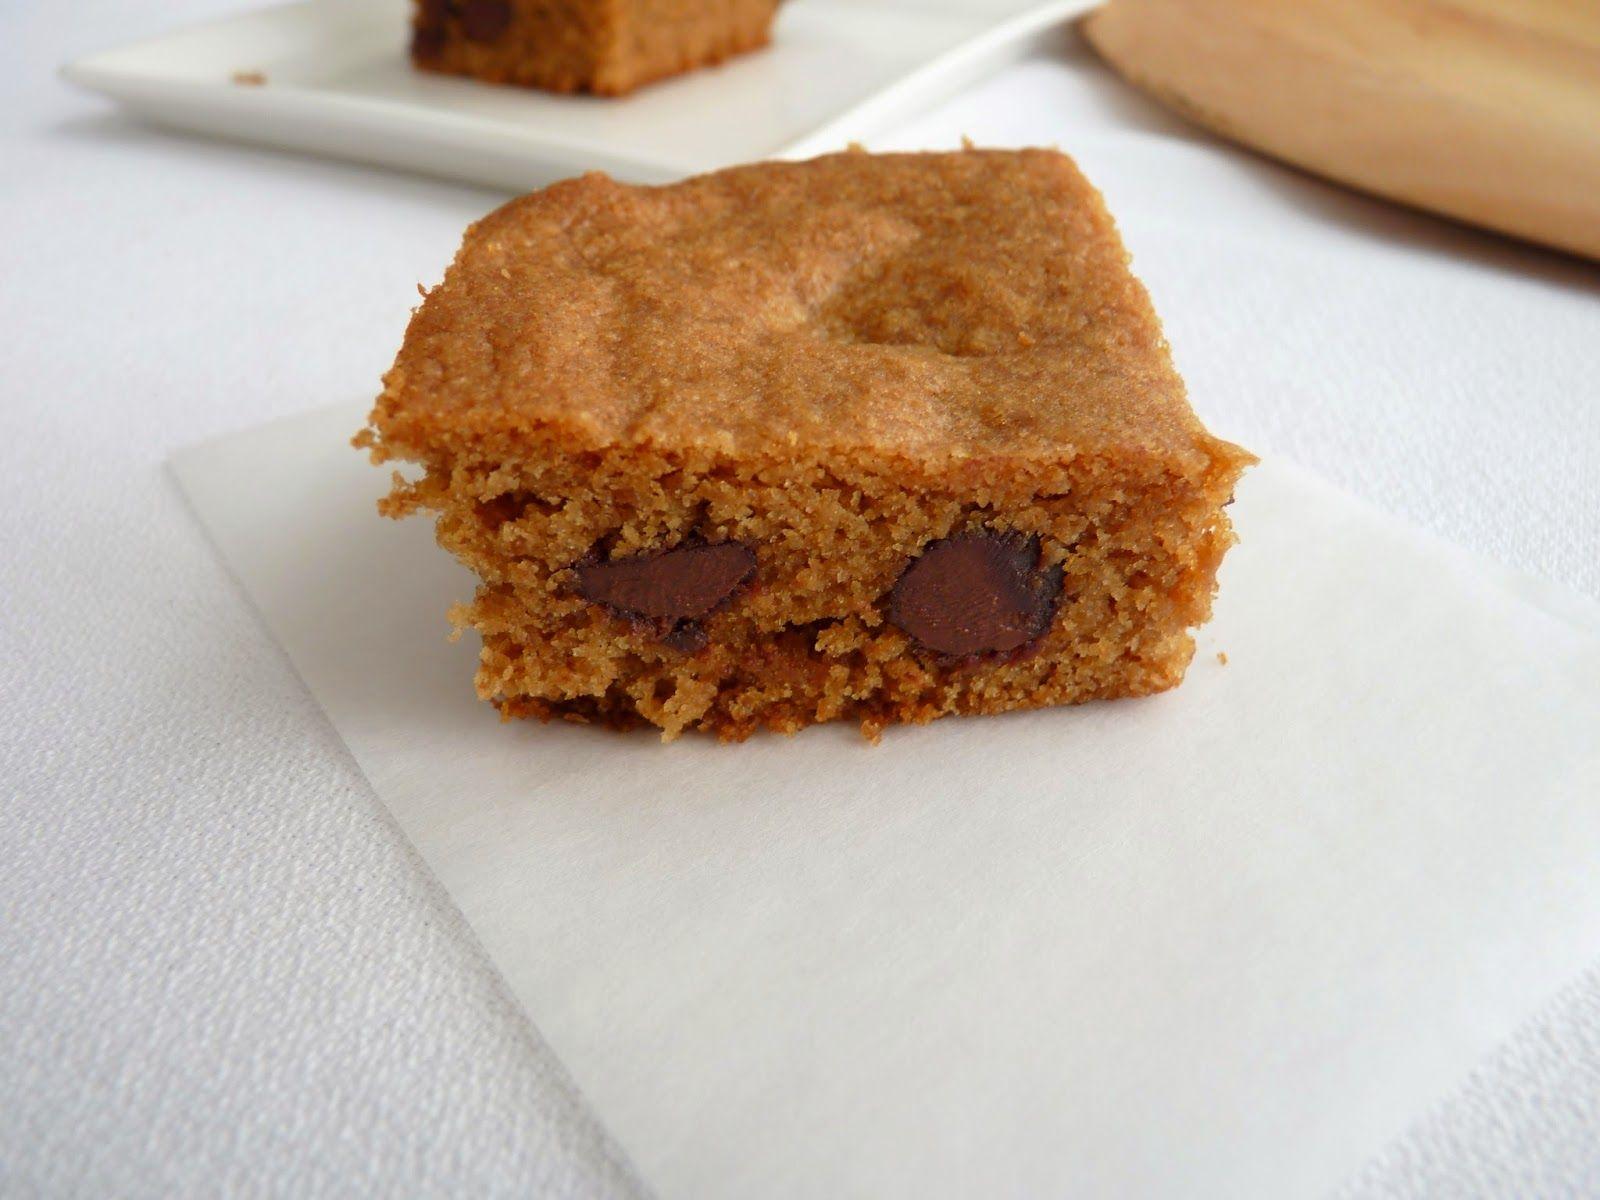 :pastry studio: Espresso Chocolate Chip Blondies